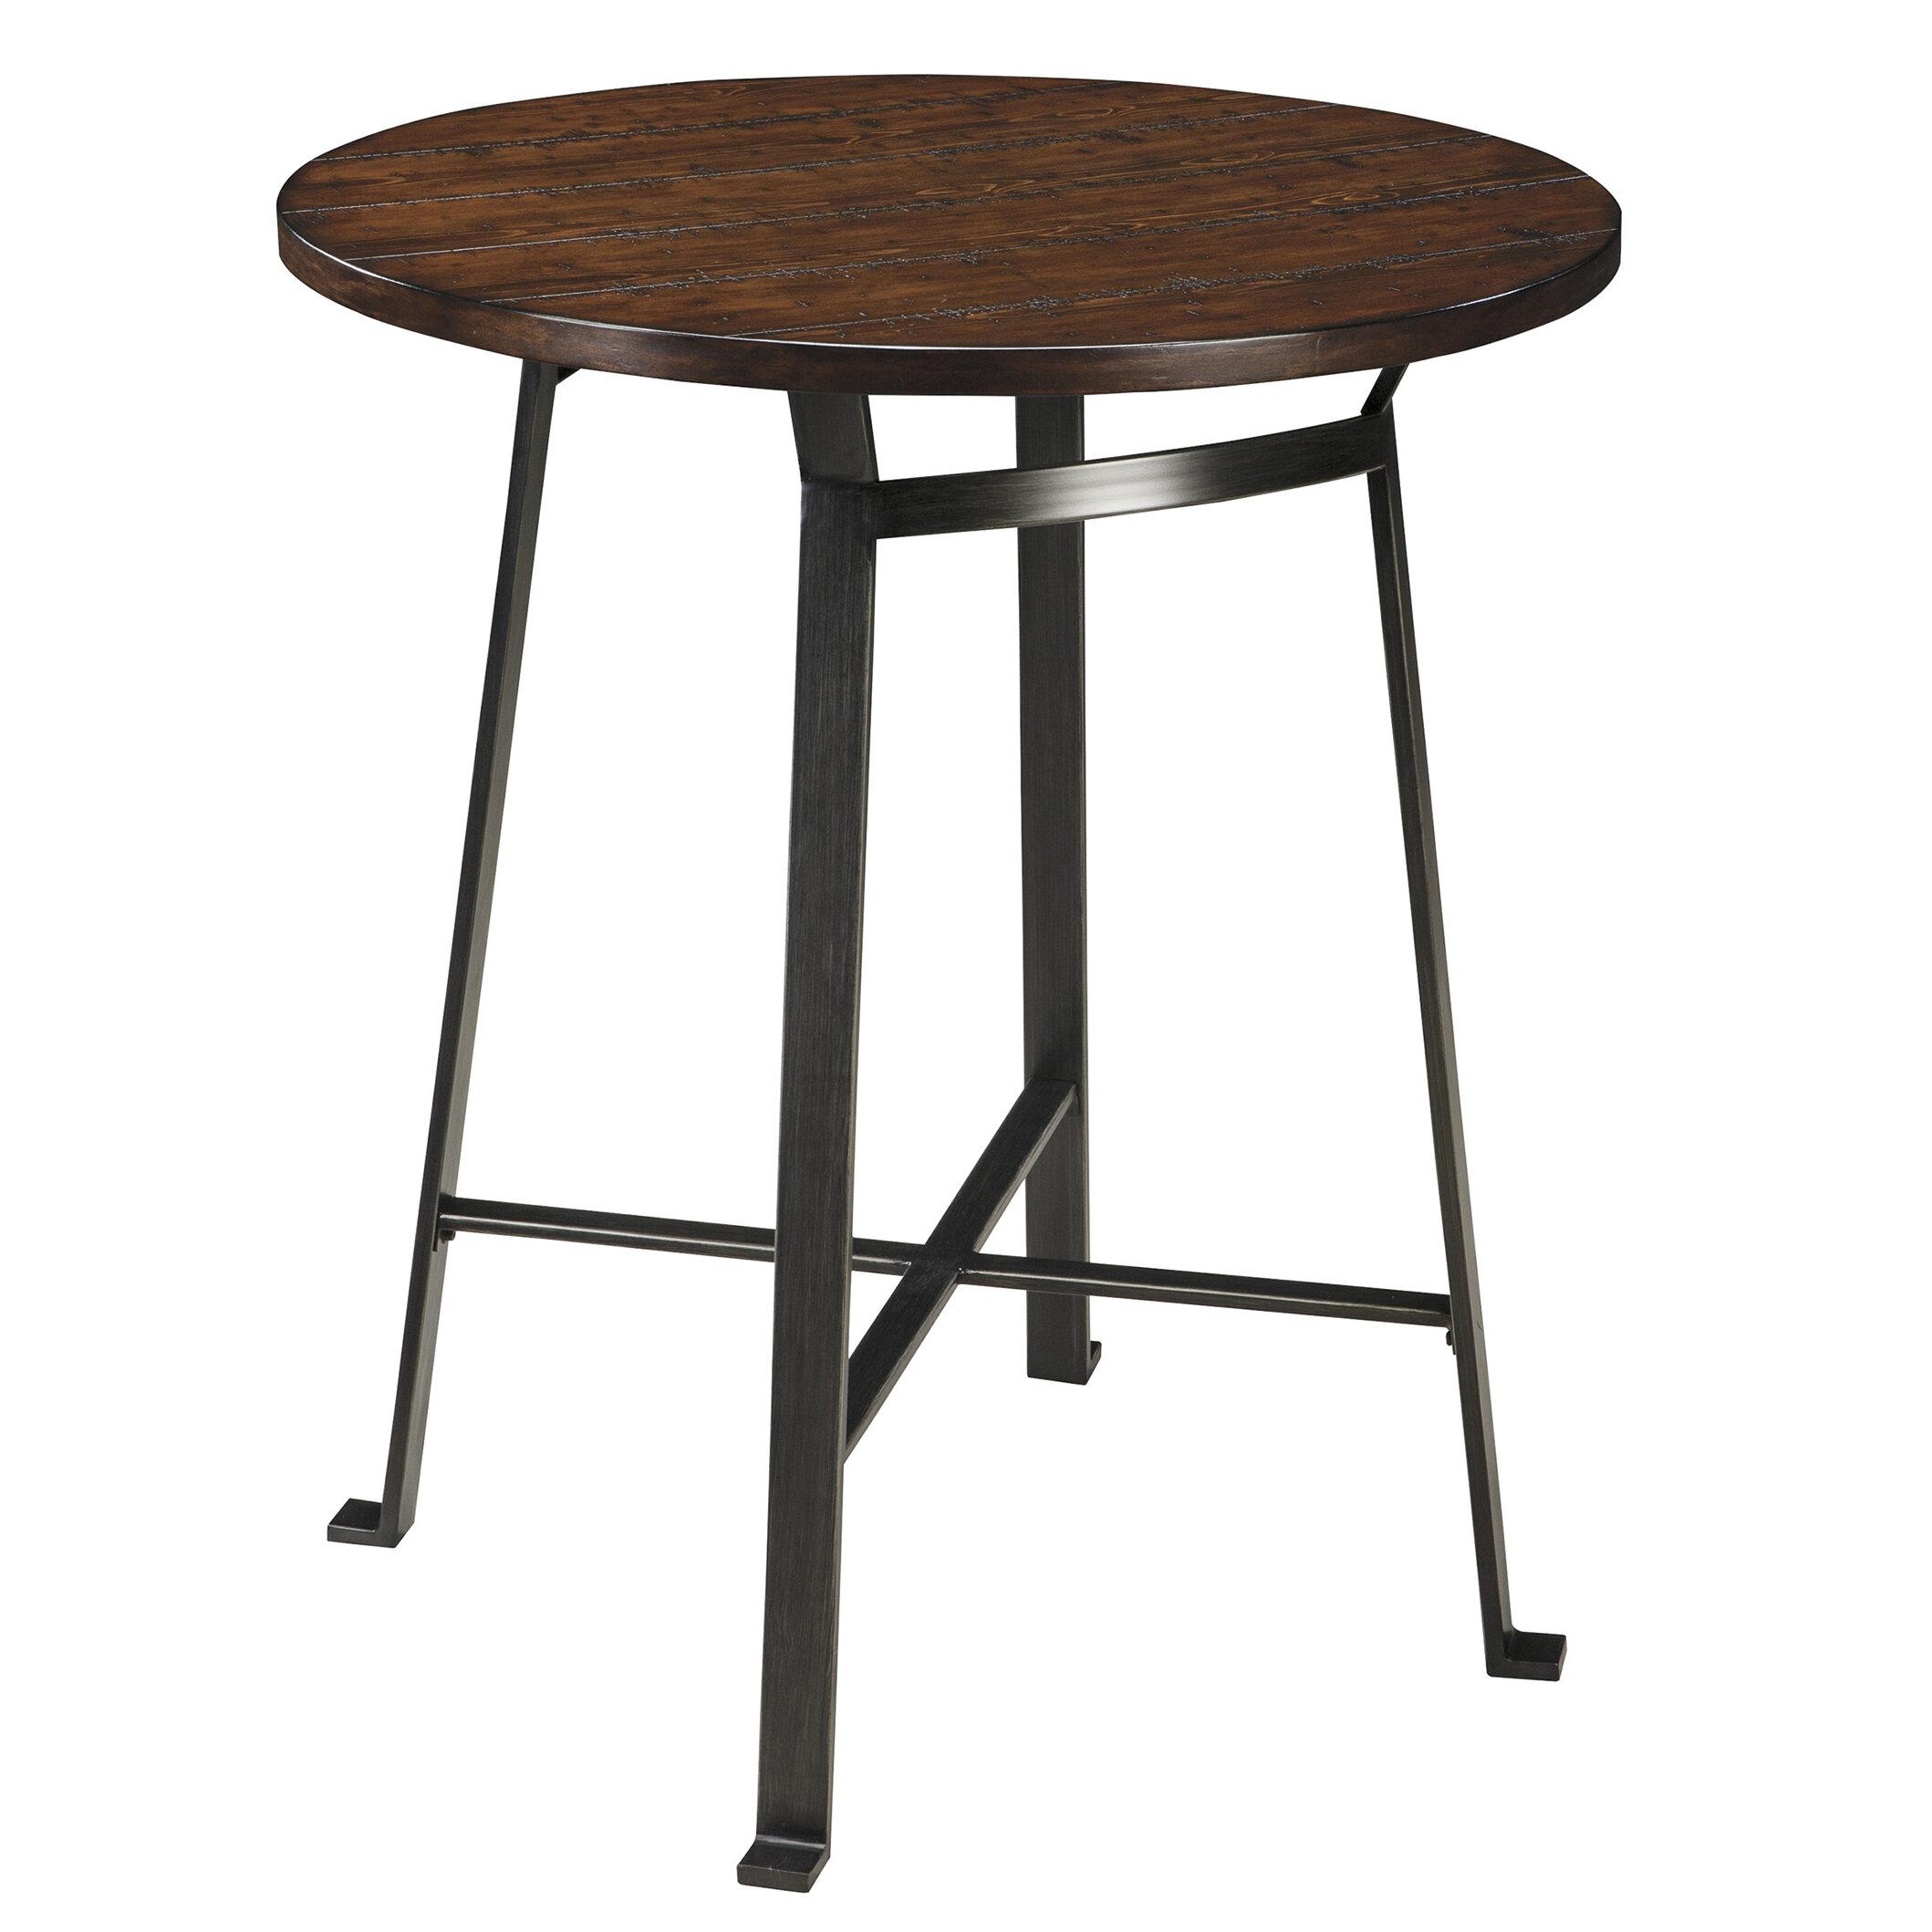 Brayden studio dube round drm pub table reviews wayfair for Cie publication 85 table 2